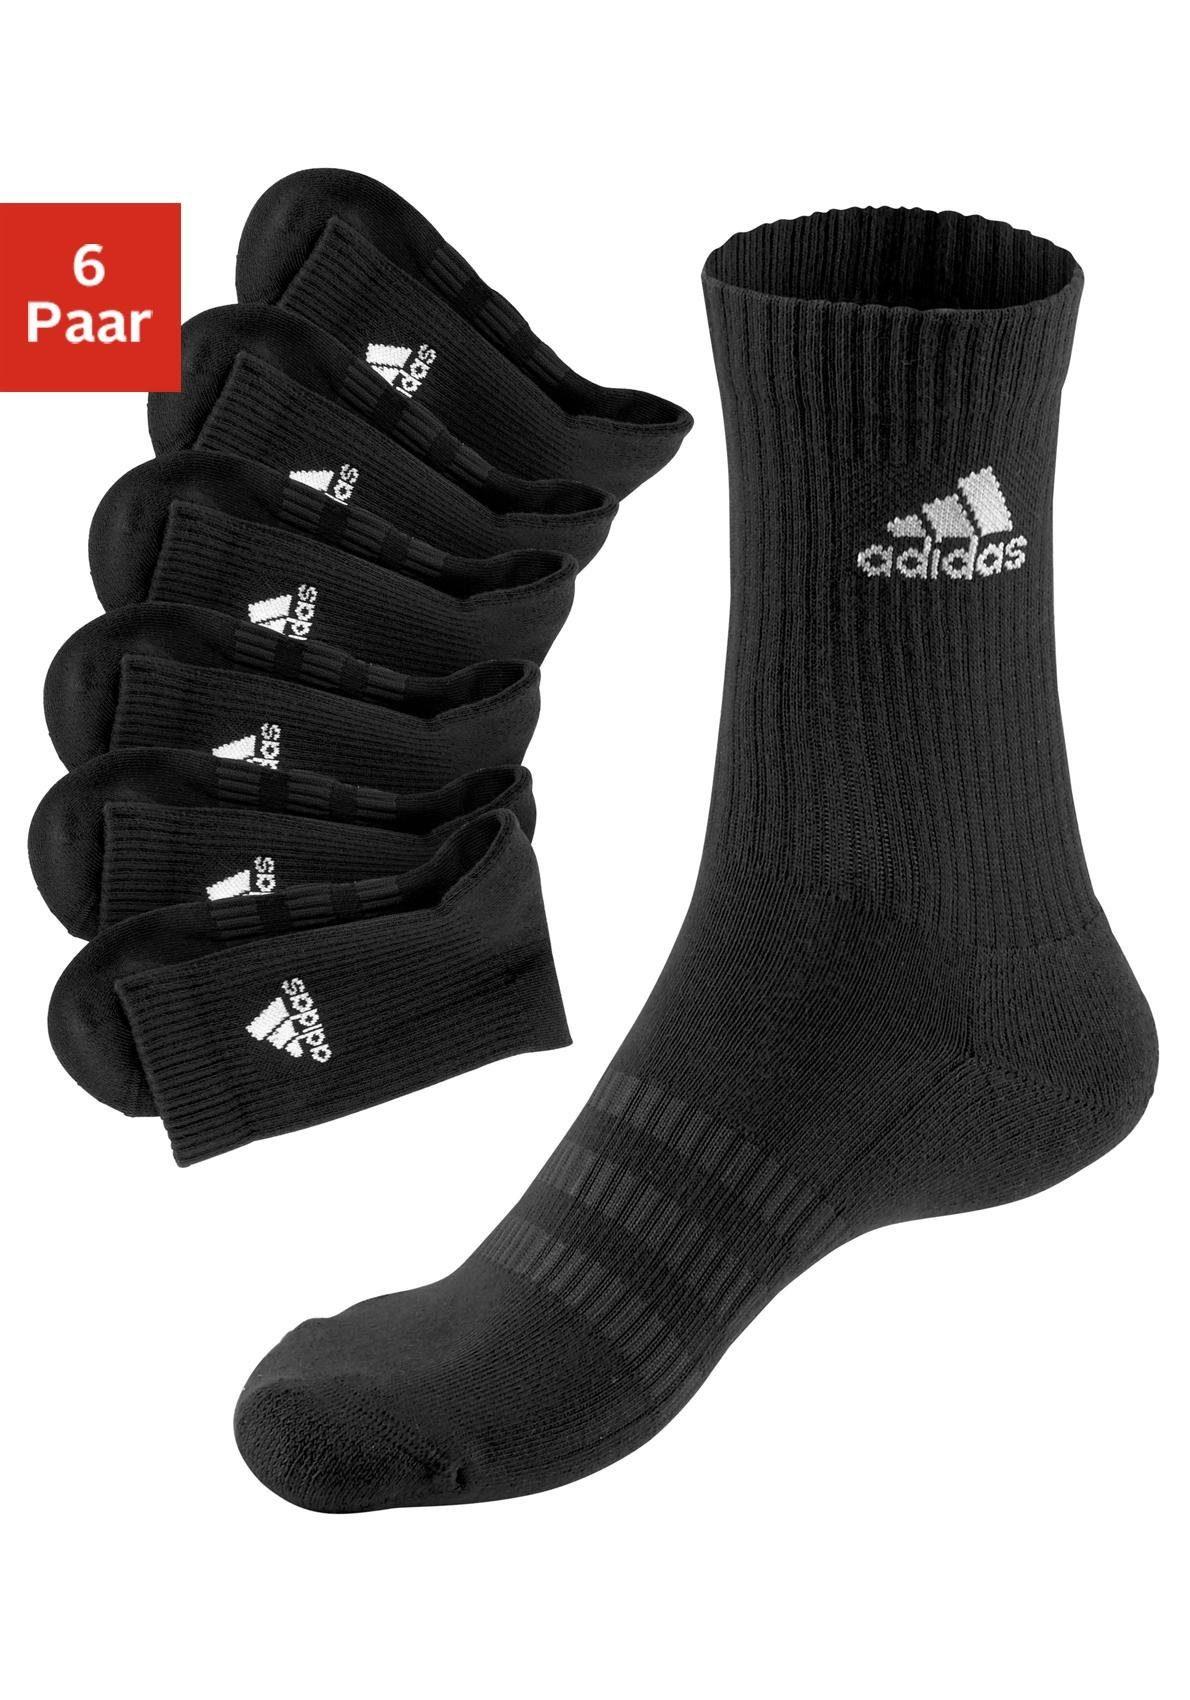 TOPSELLER: adidas Performance Tennissocken (6 Paar) Herrenmode/Wäsche & Bademode/Wäsche/Socken/Sportsocken/Tennissocken